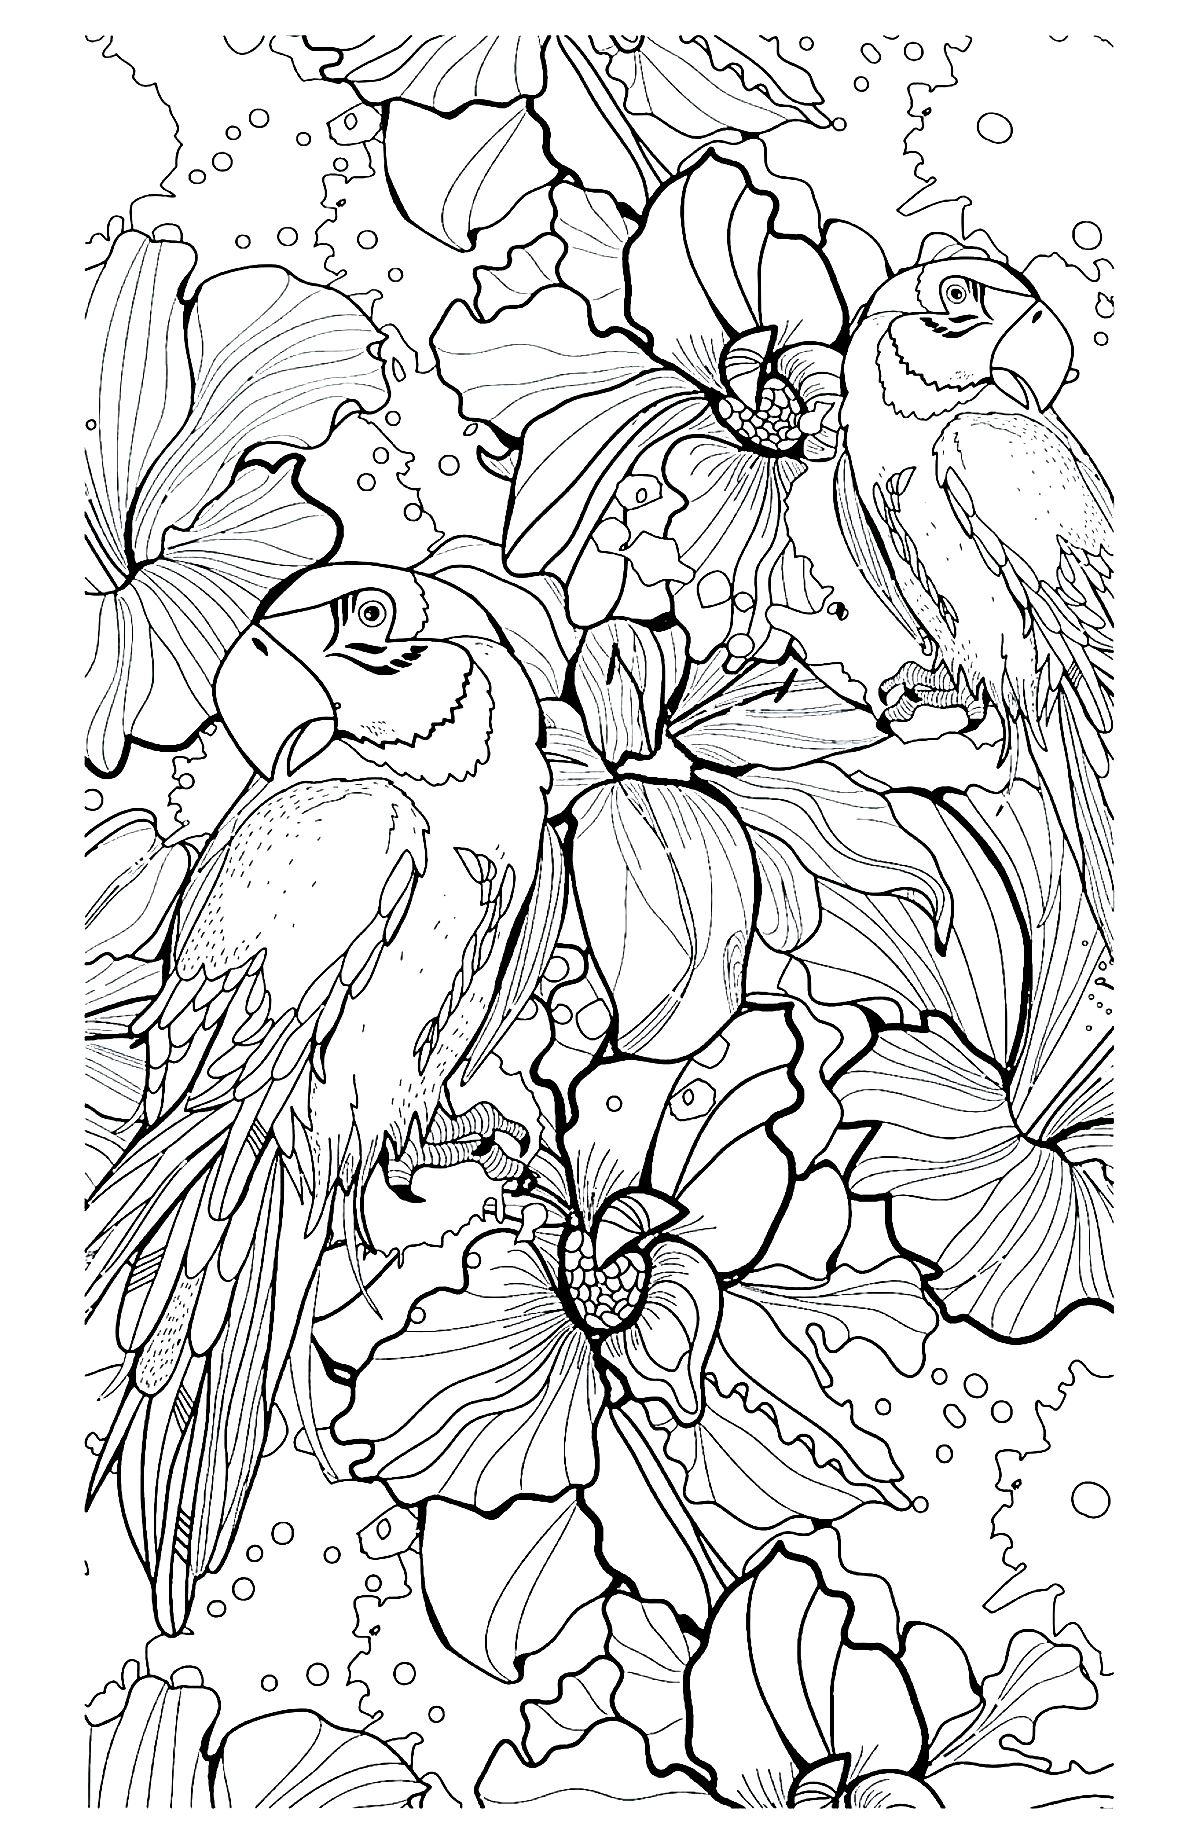 Malbuch Fur Erwachsene  : Vögel - 5